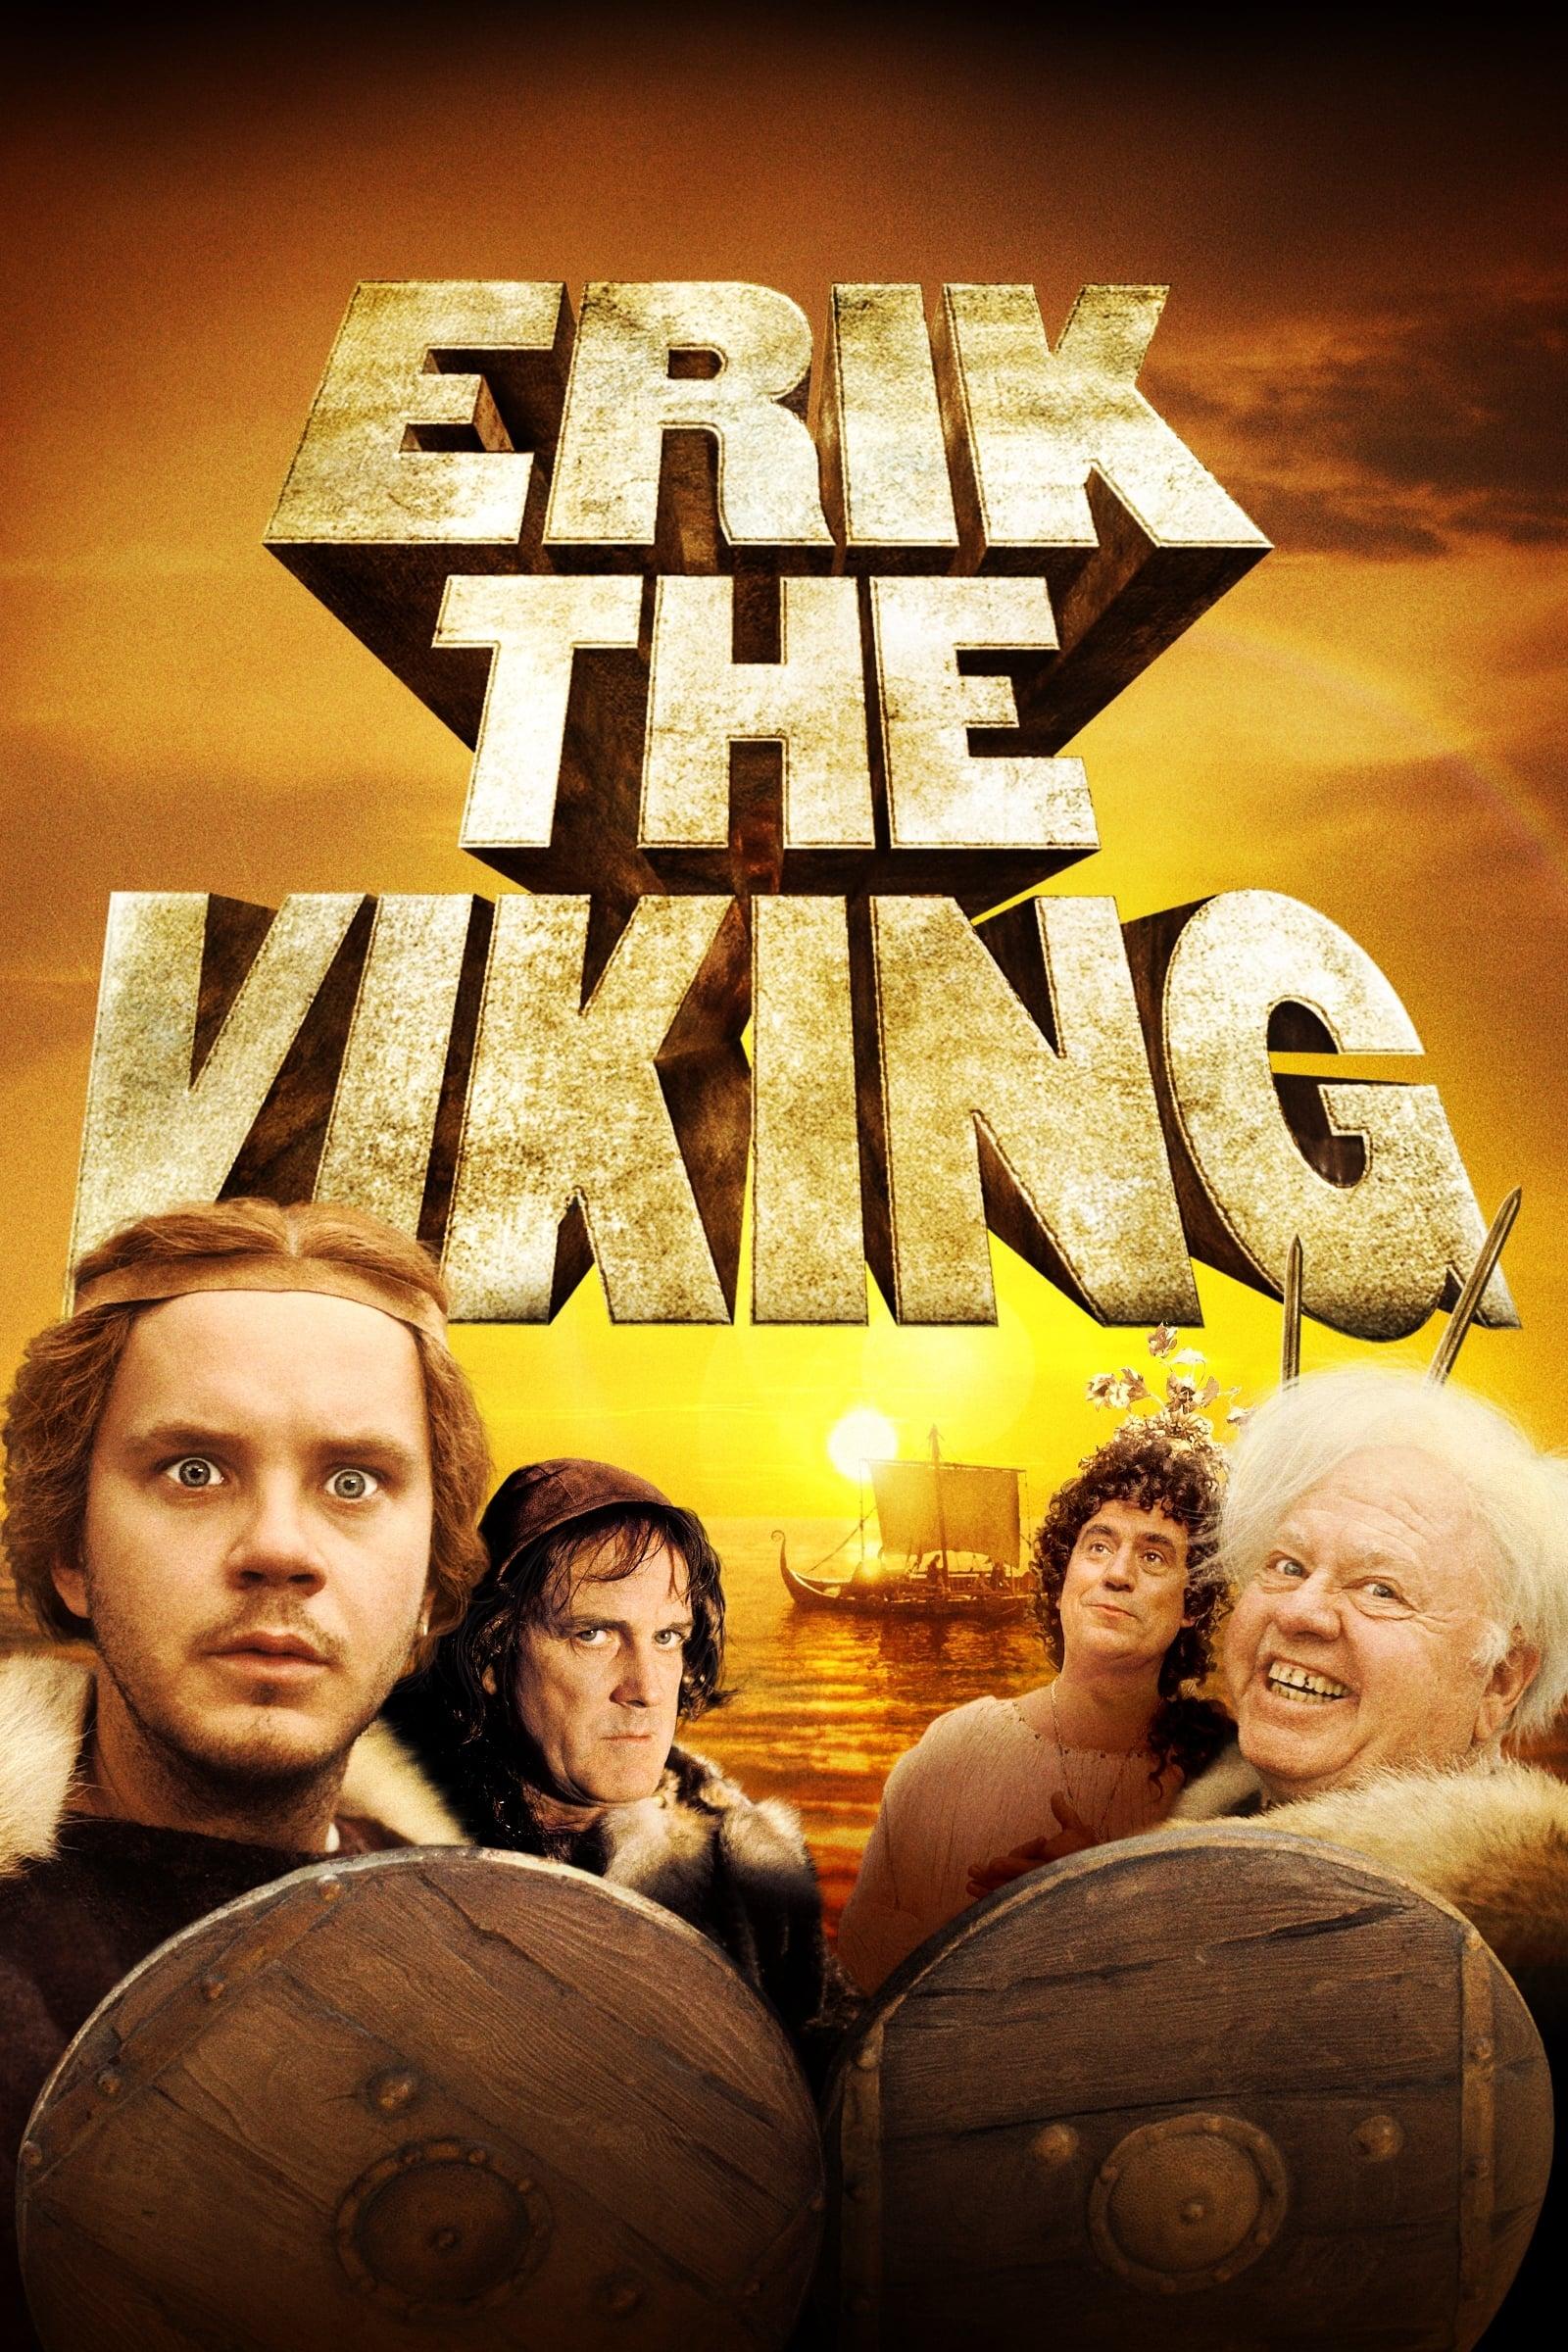 Regarder Erik le viking en streaming gratuit